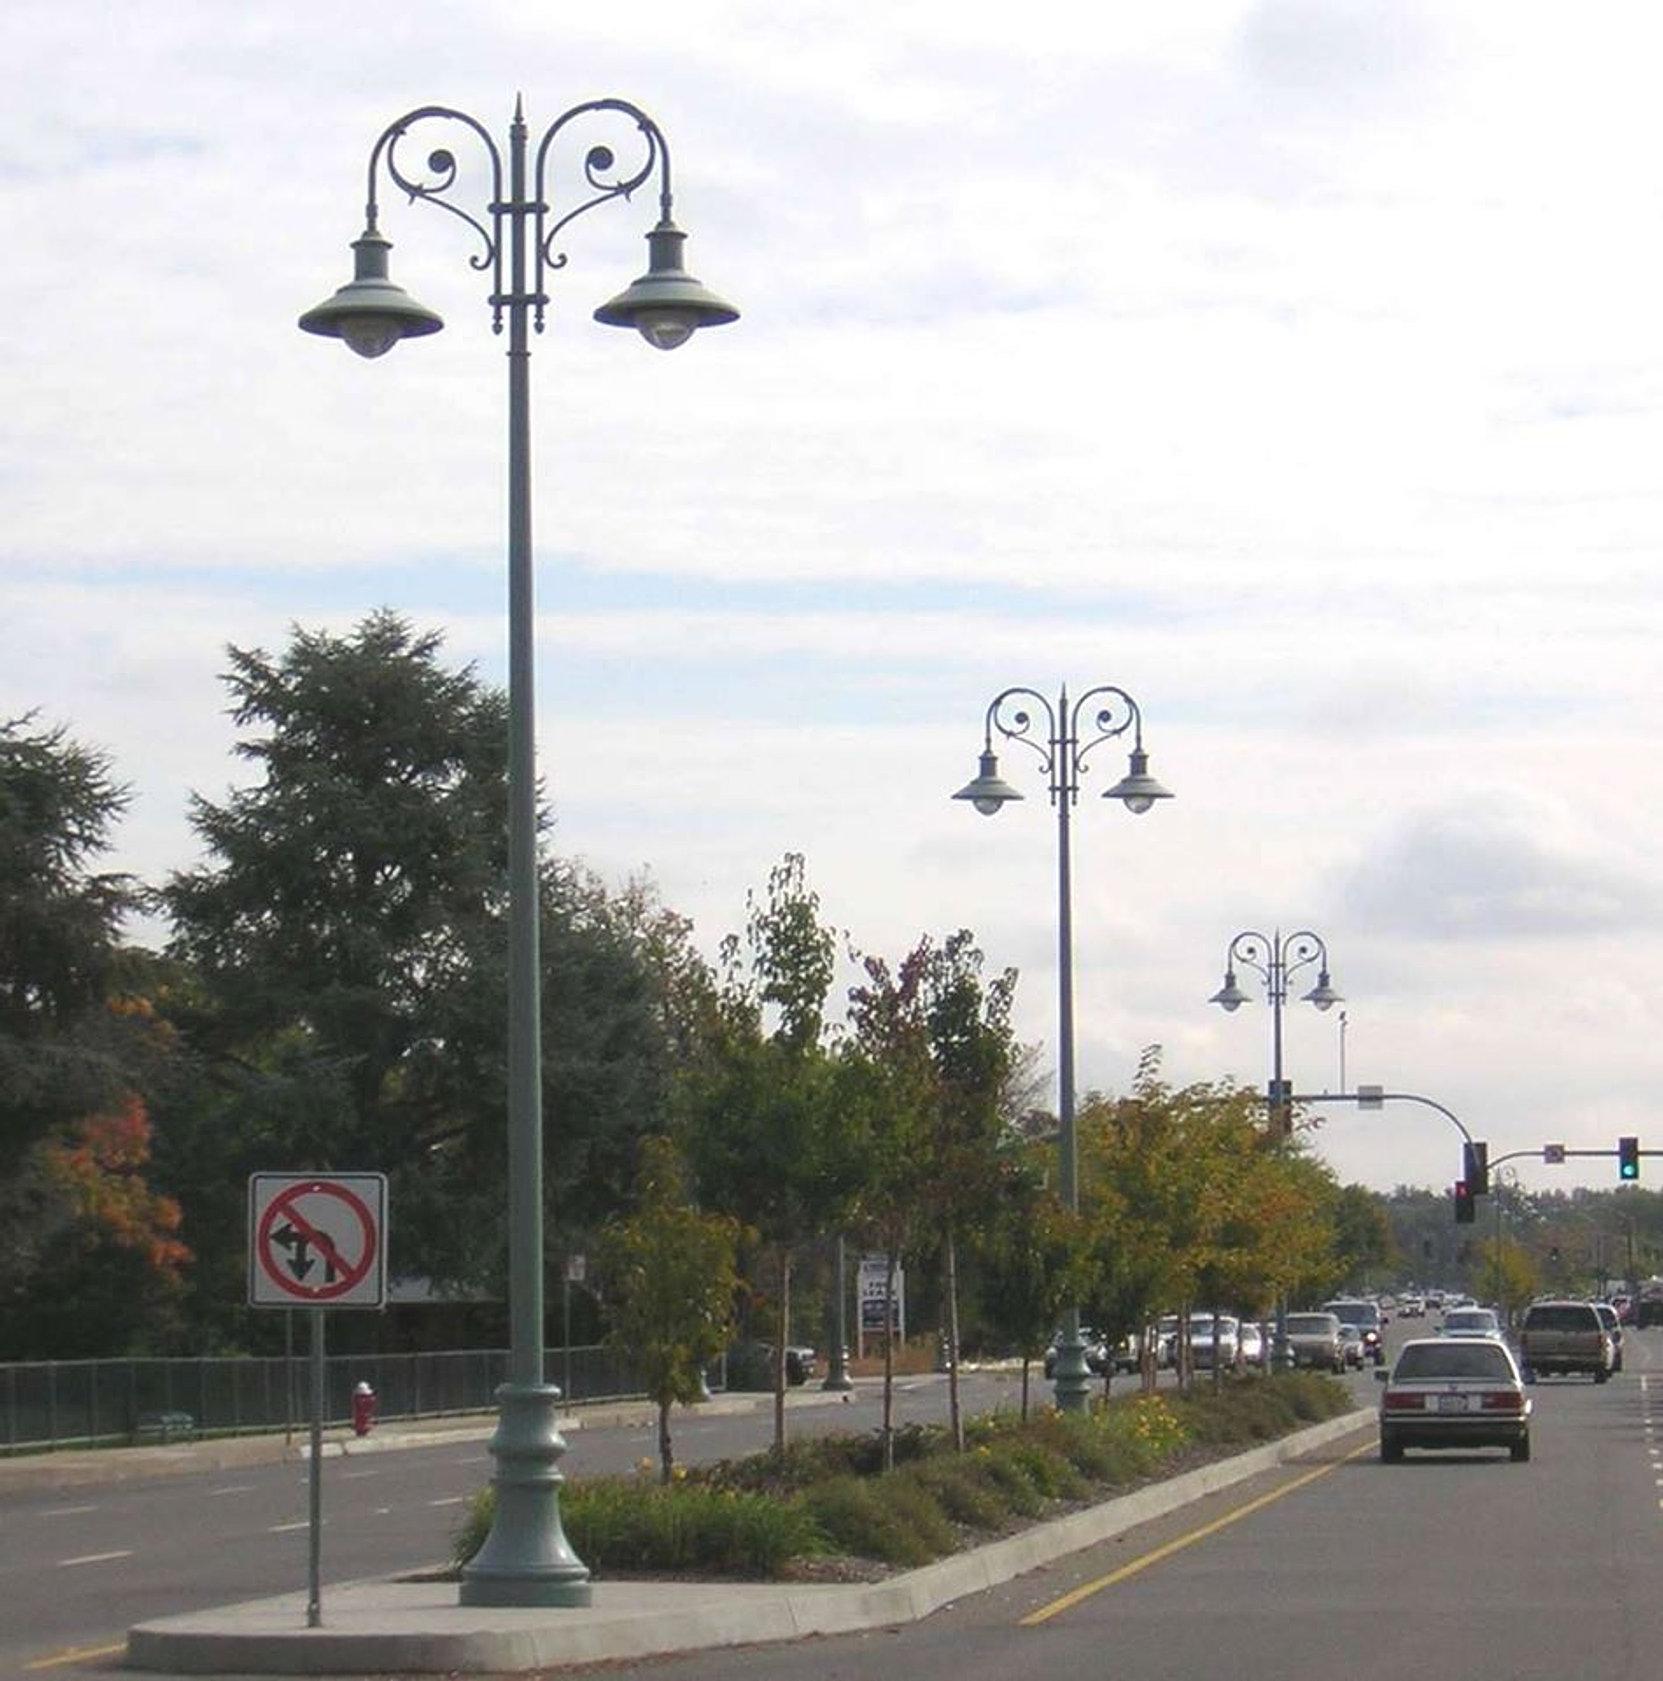 Decorative Light Poles rothlighting | decorative poles and metal fab